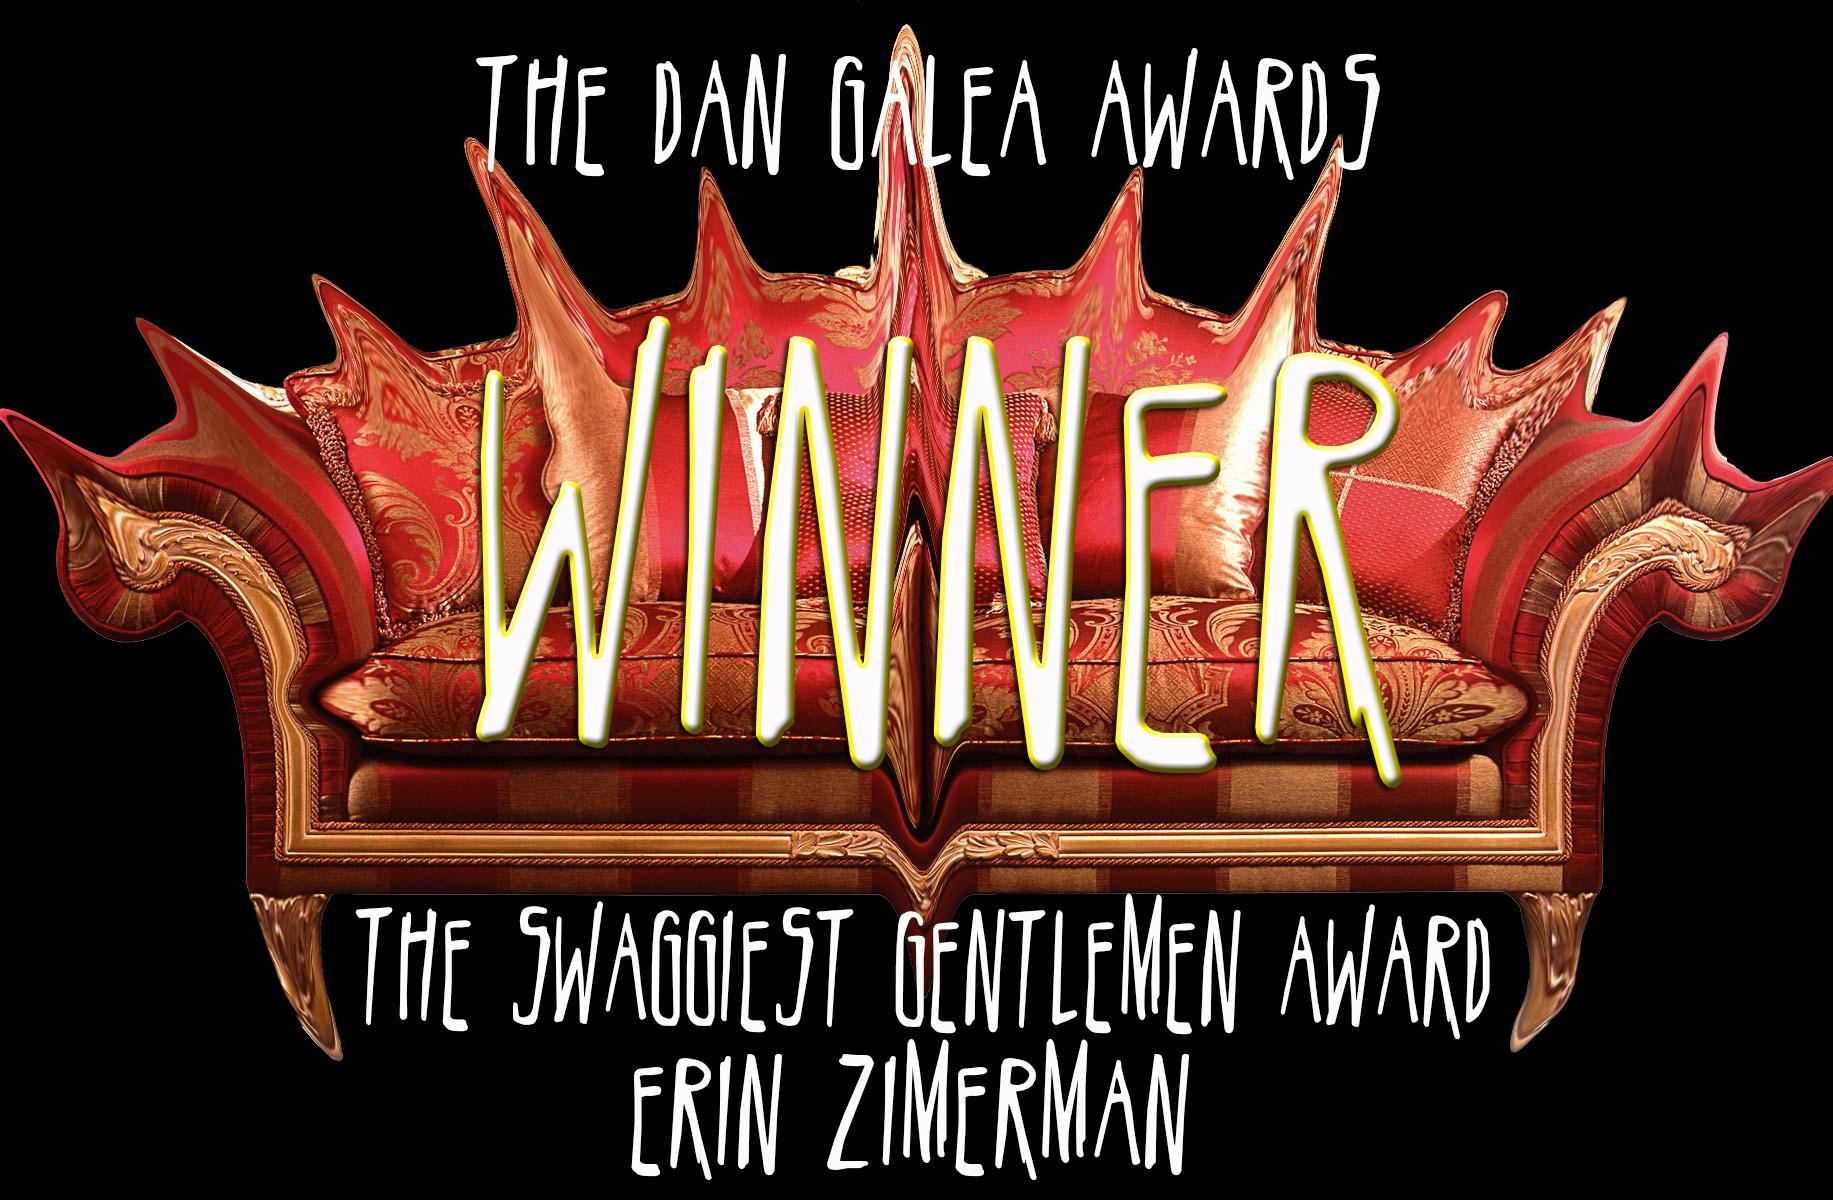 DGawards Erin Zimerman.jpg